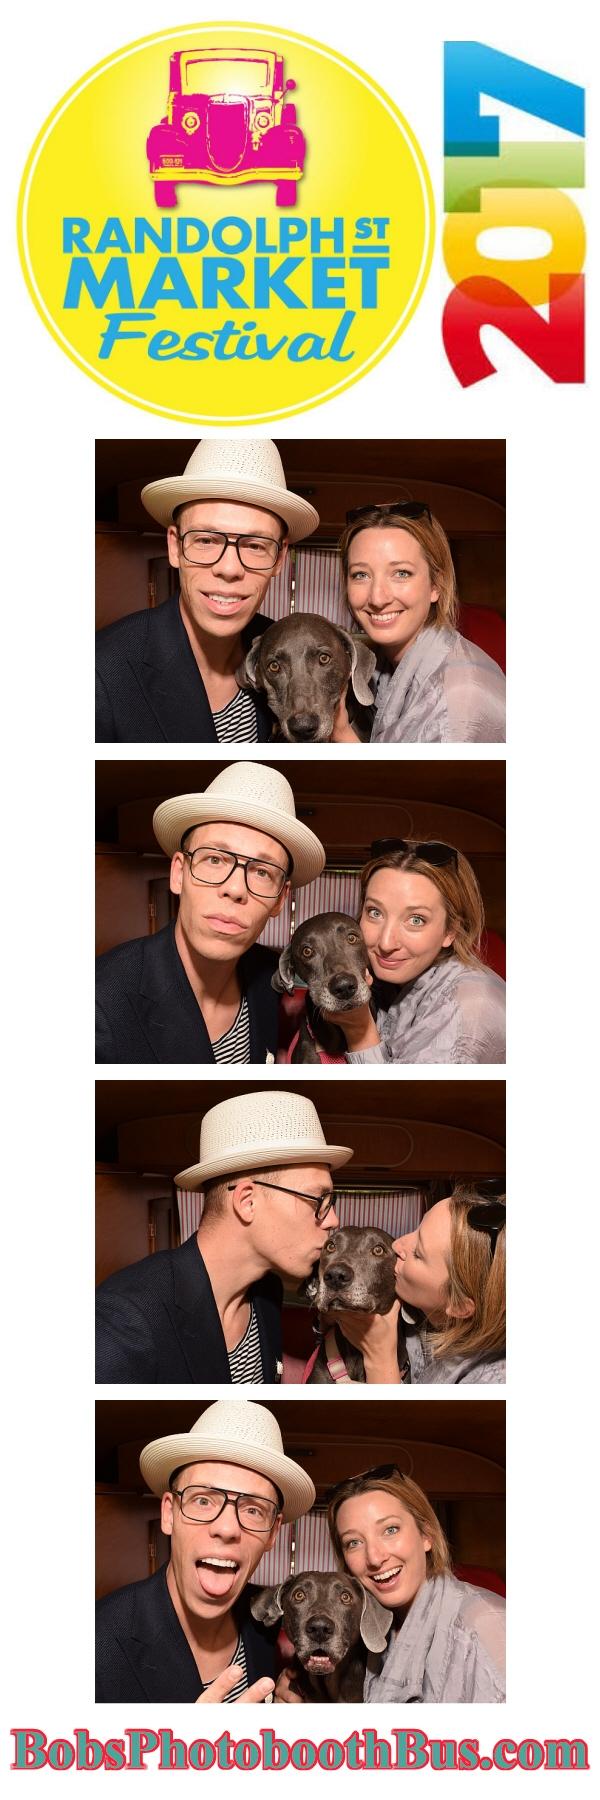 Couple with dog photo strip.jpg